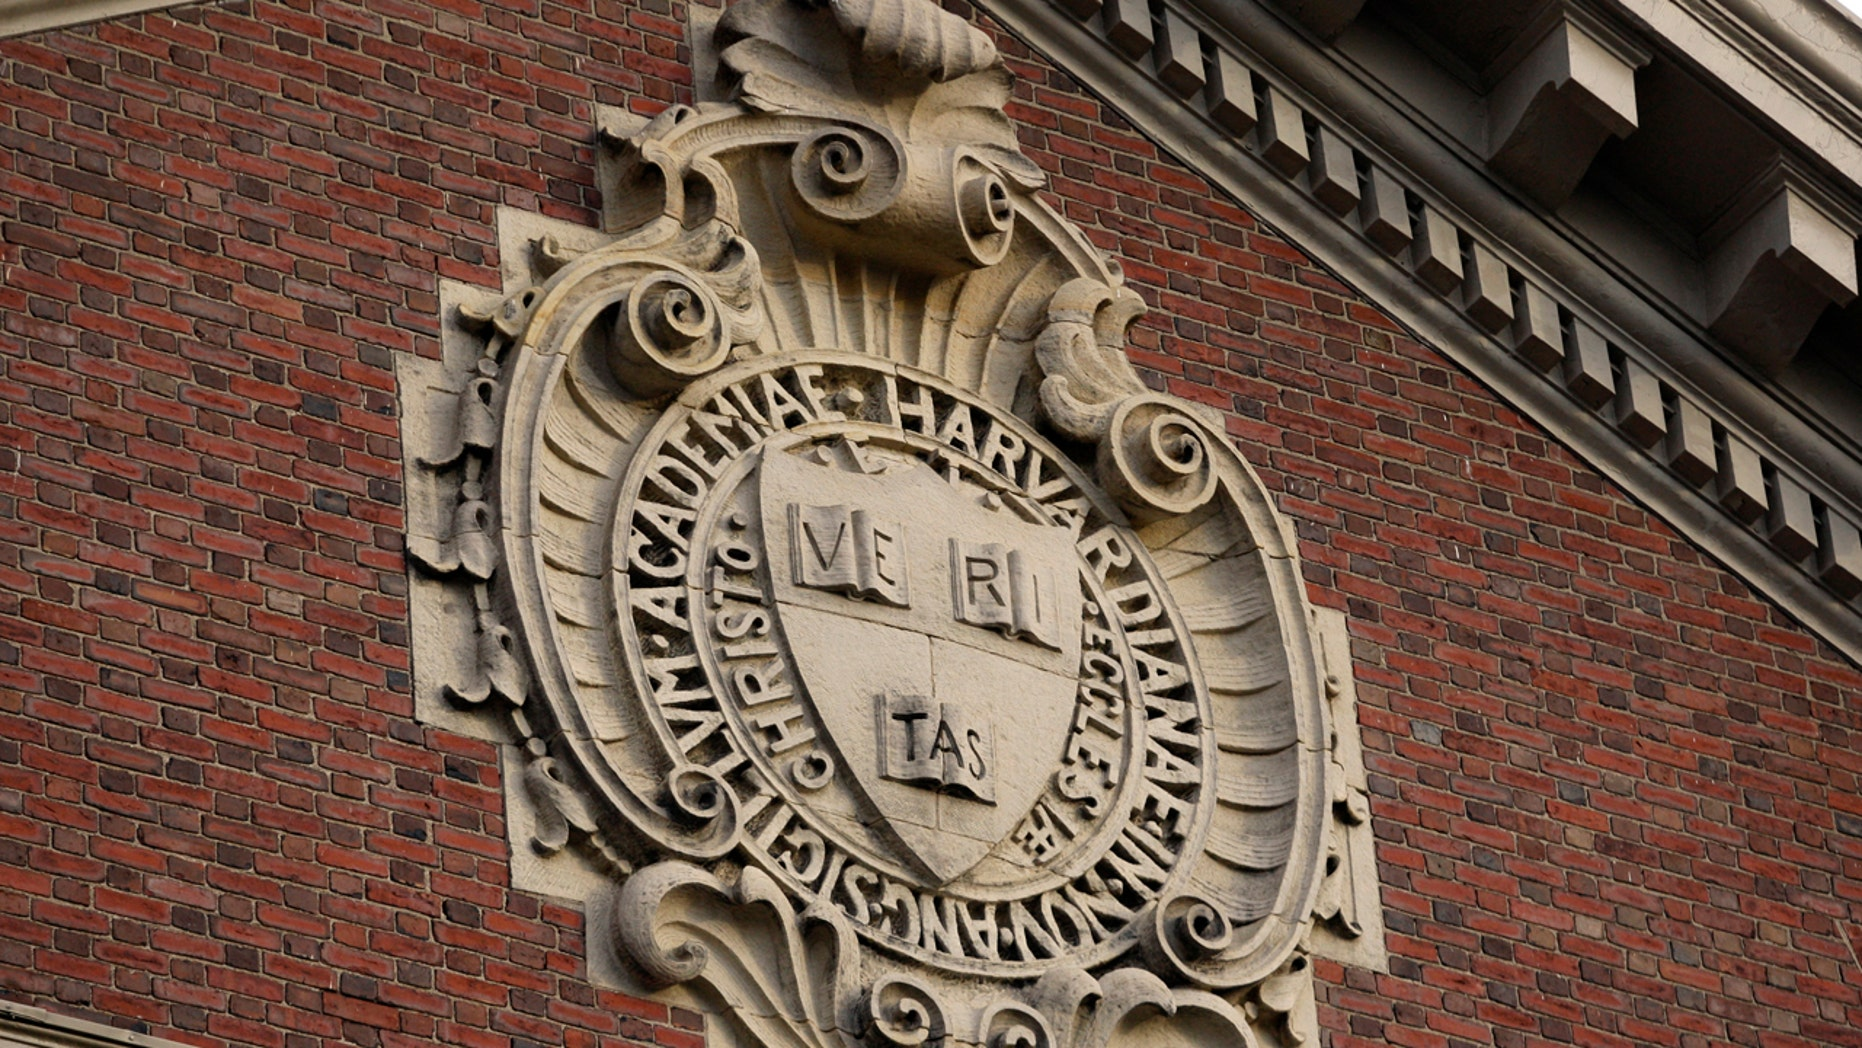 The university seal hangs over a building at Harvard University in Cambridge, Massachusetts, Nov. 16, 2012.